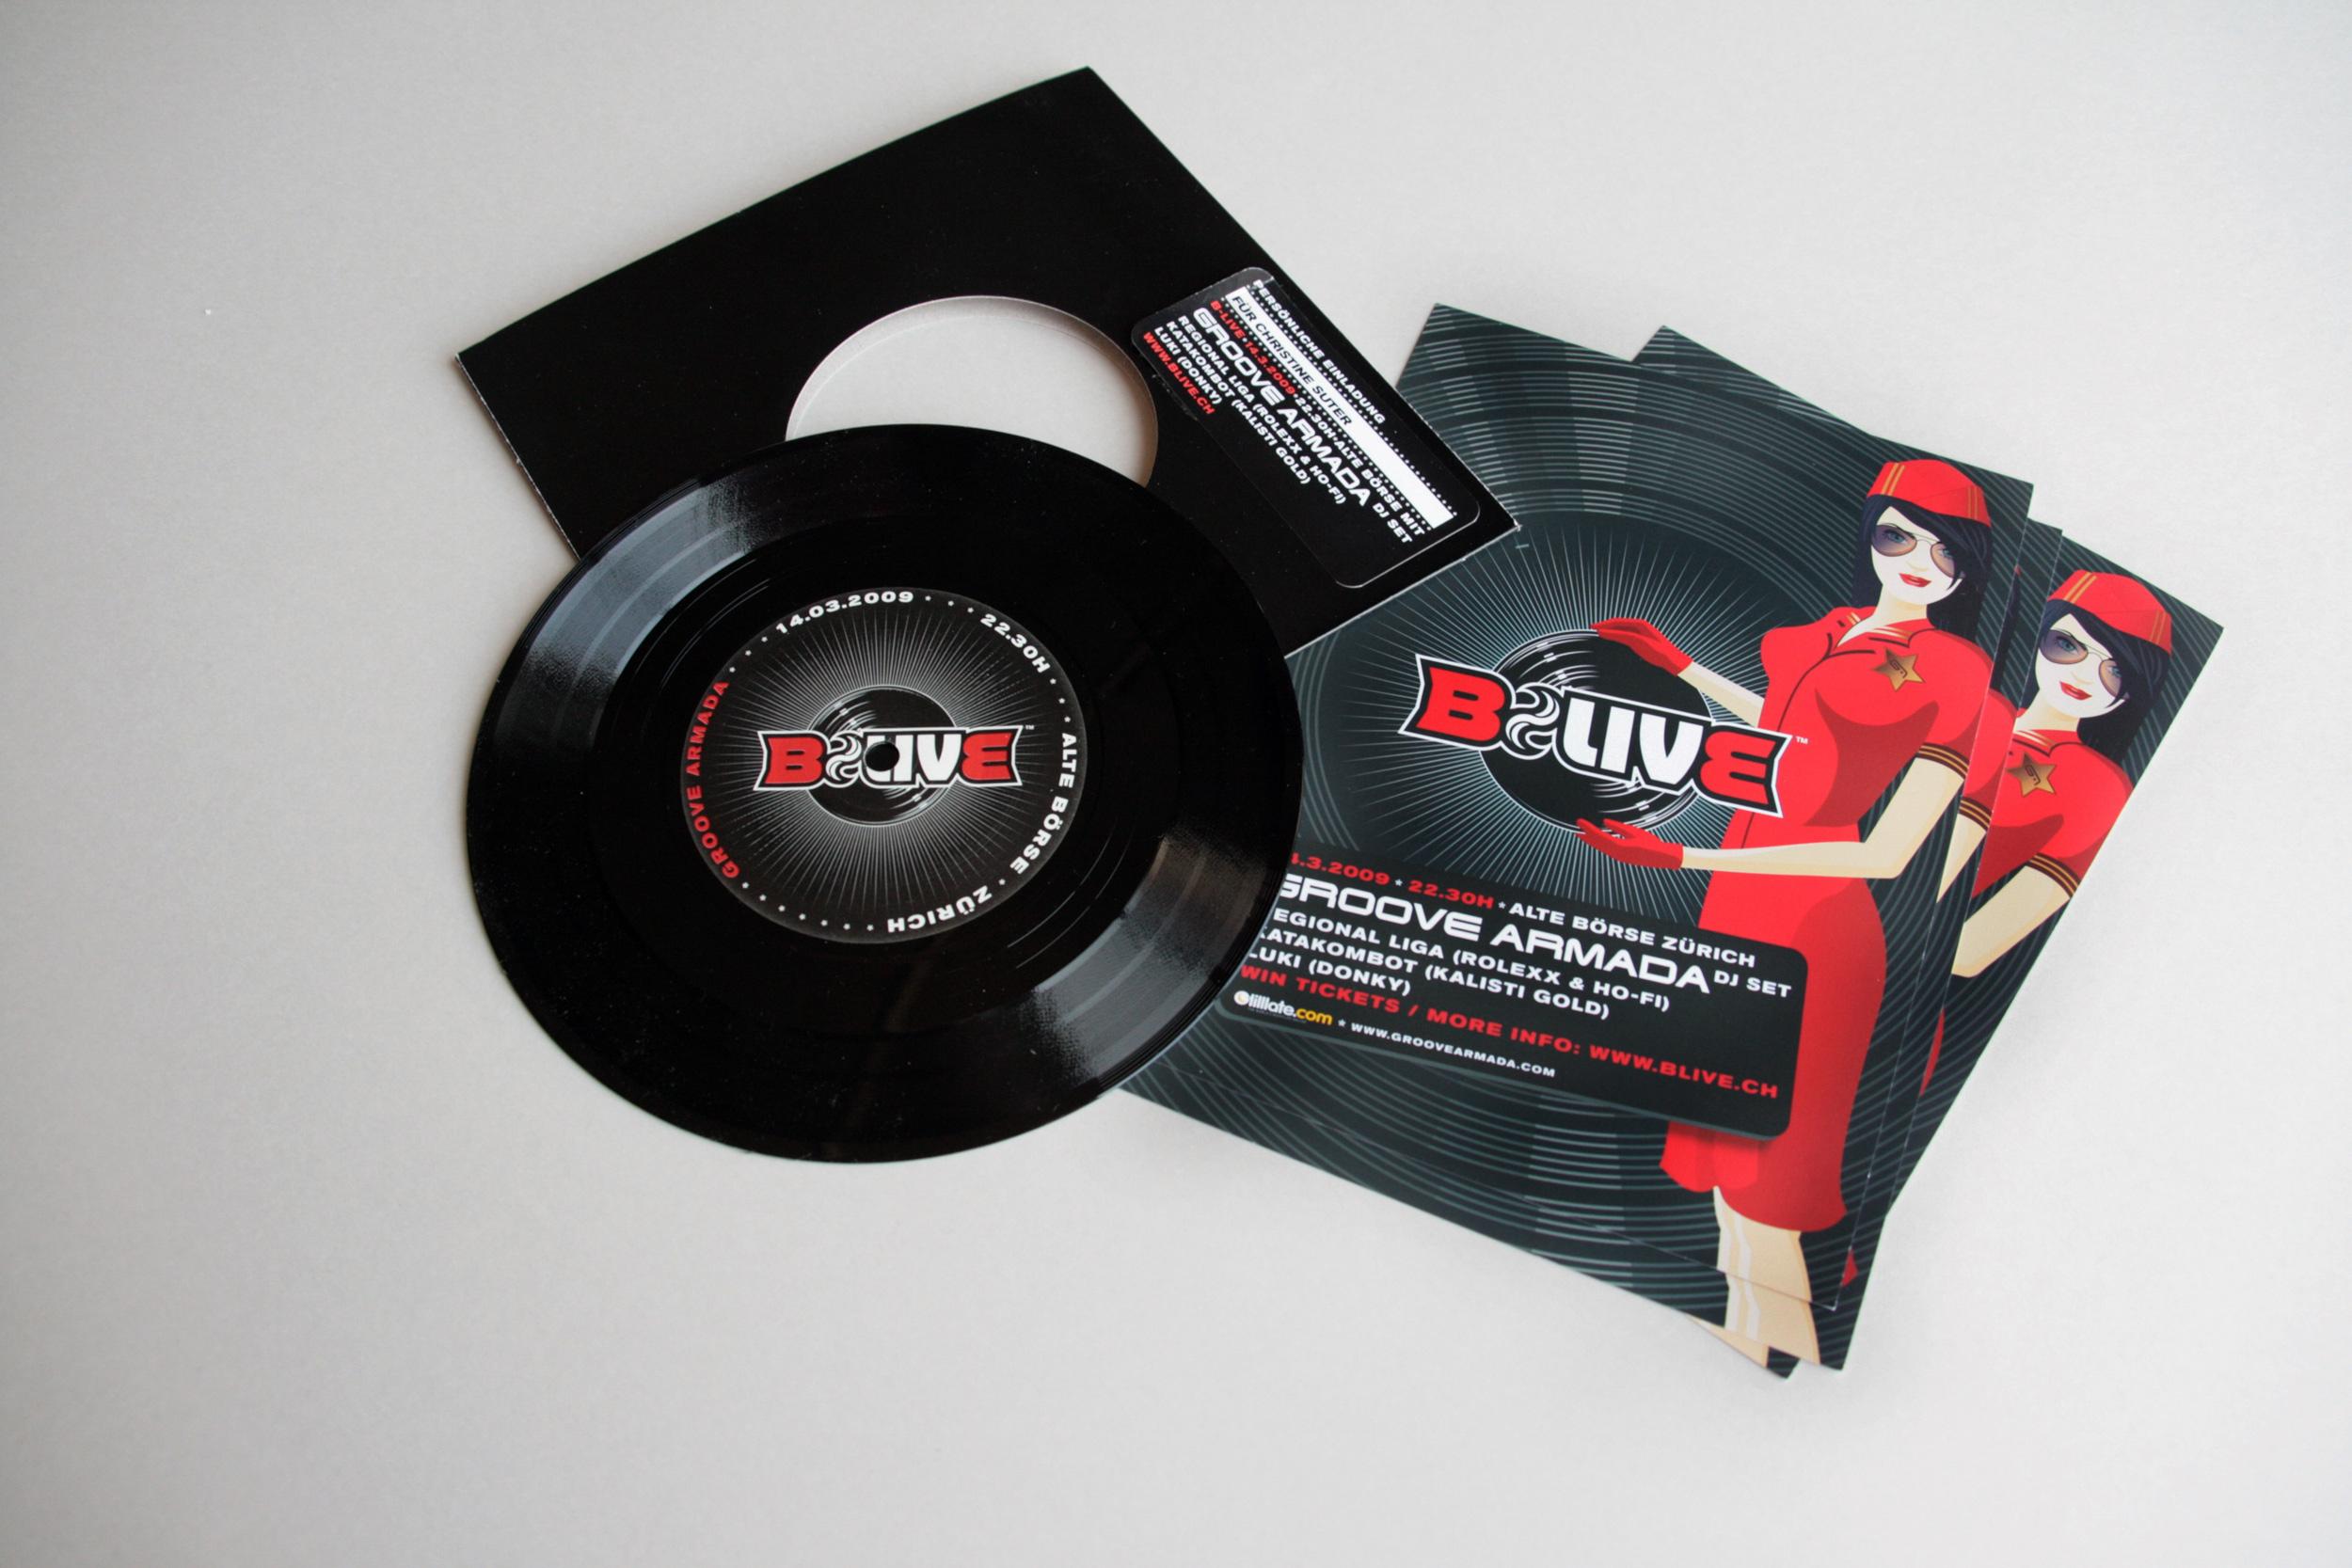 B-Live Single, Flyer